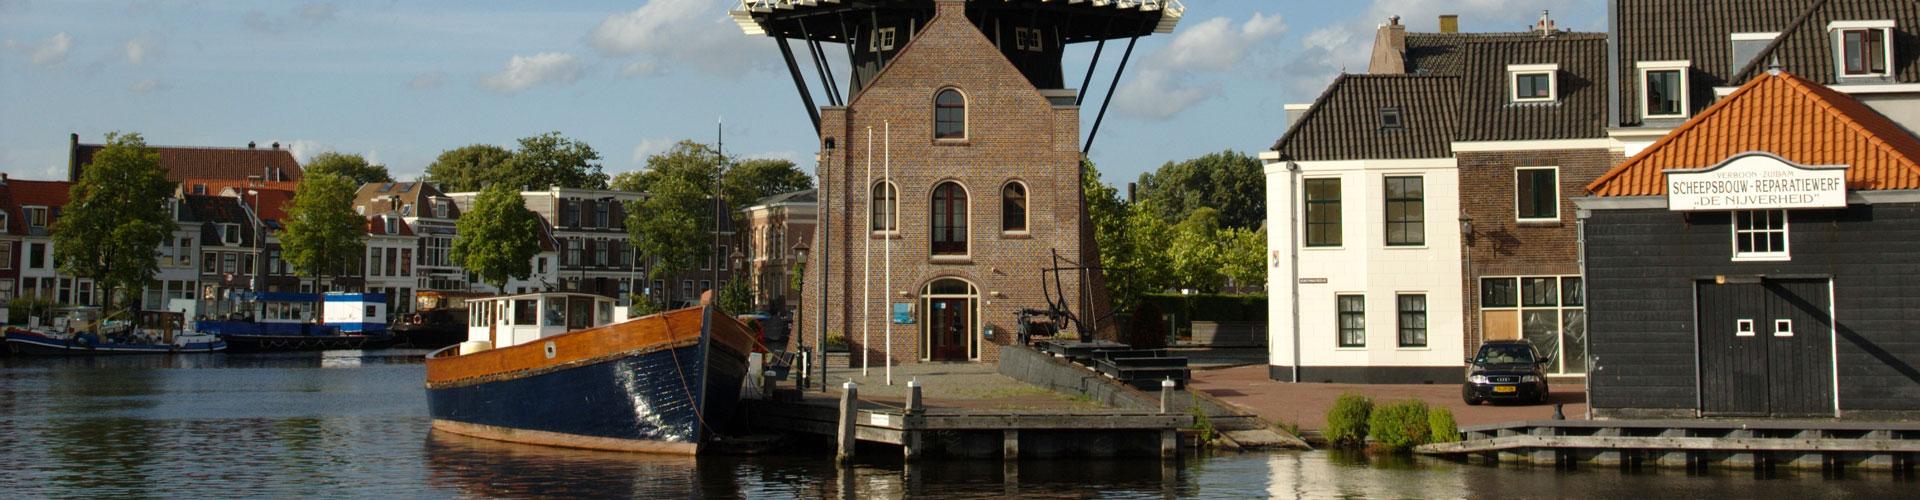 Letselschade Haarlem claimen